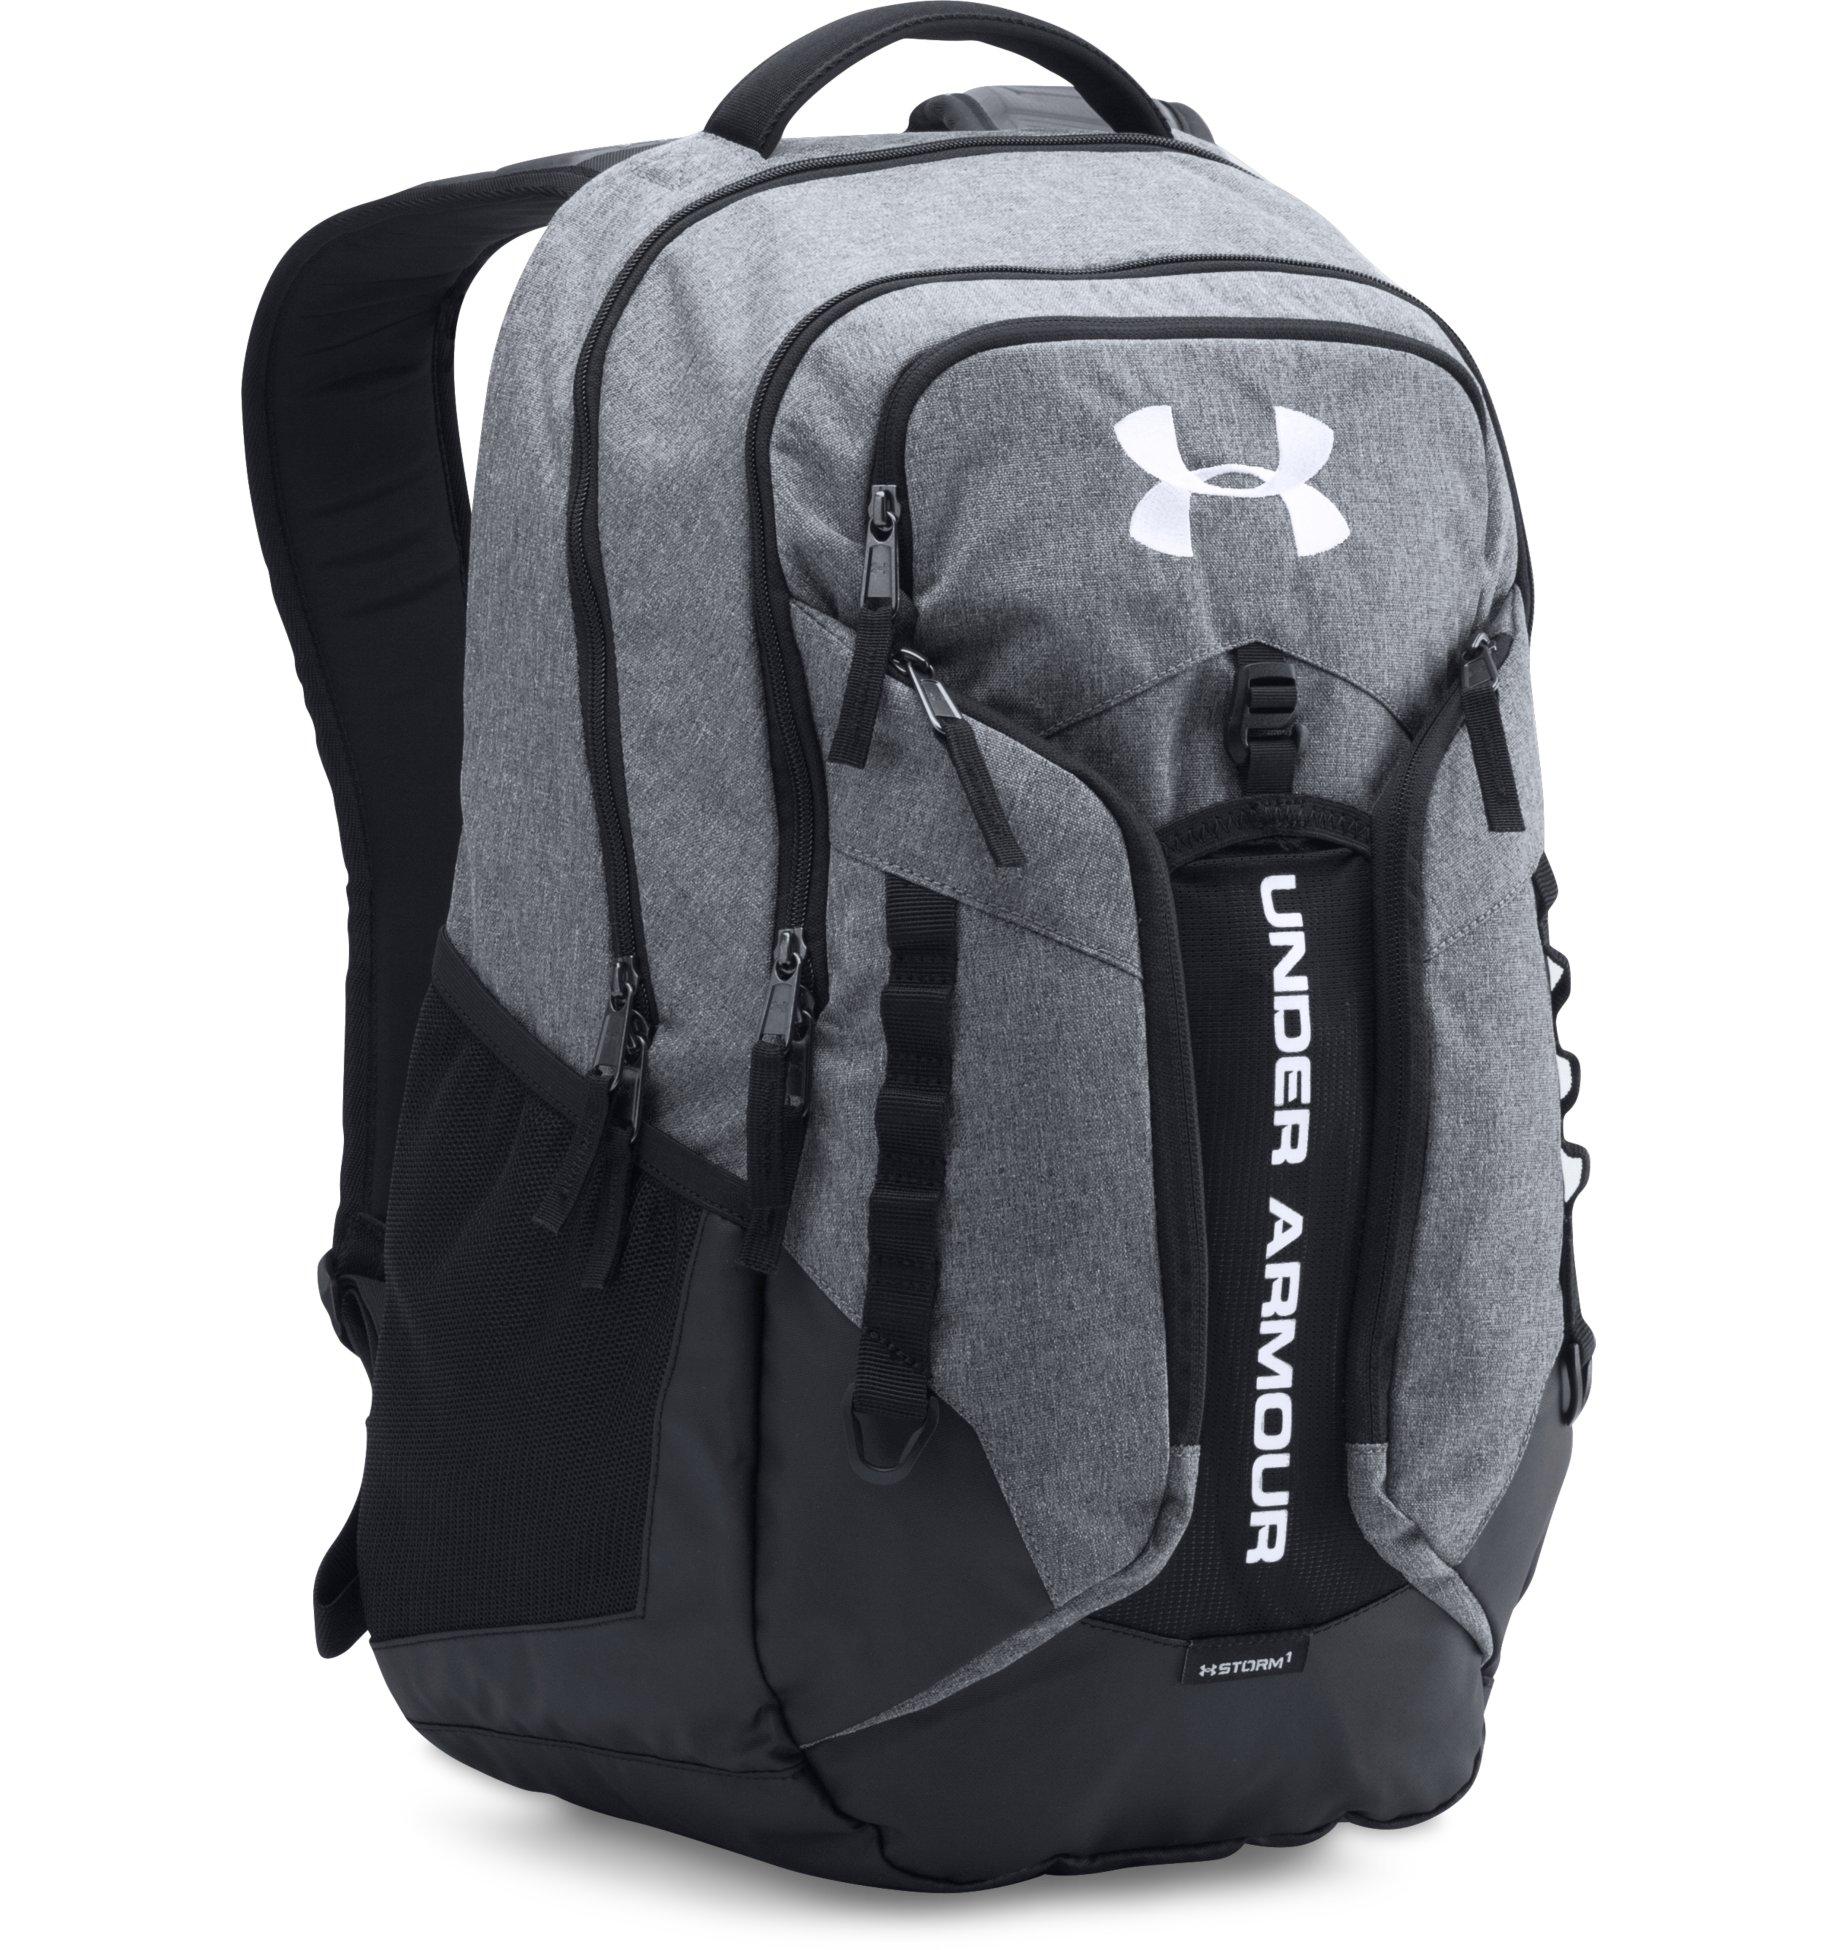 bd0d058cea UA Storm Contender Backpack: 2 for $77.98 ($38.99 each) & more + ...